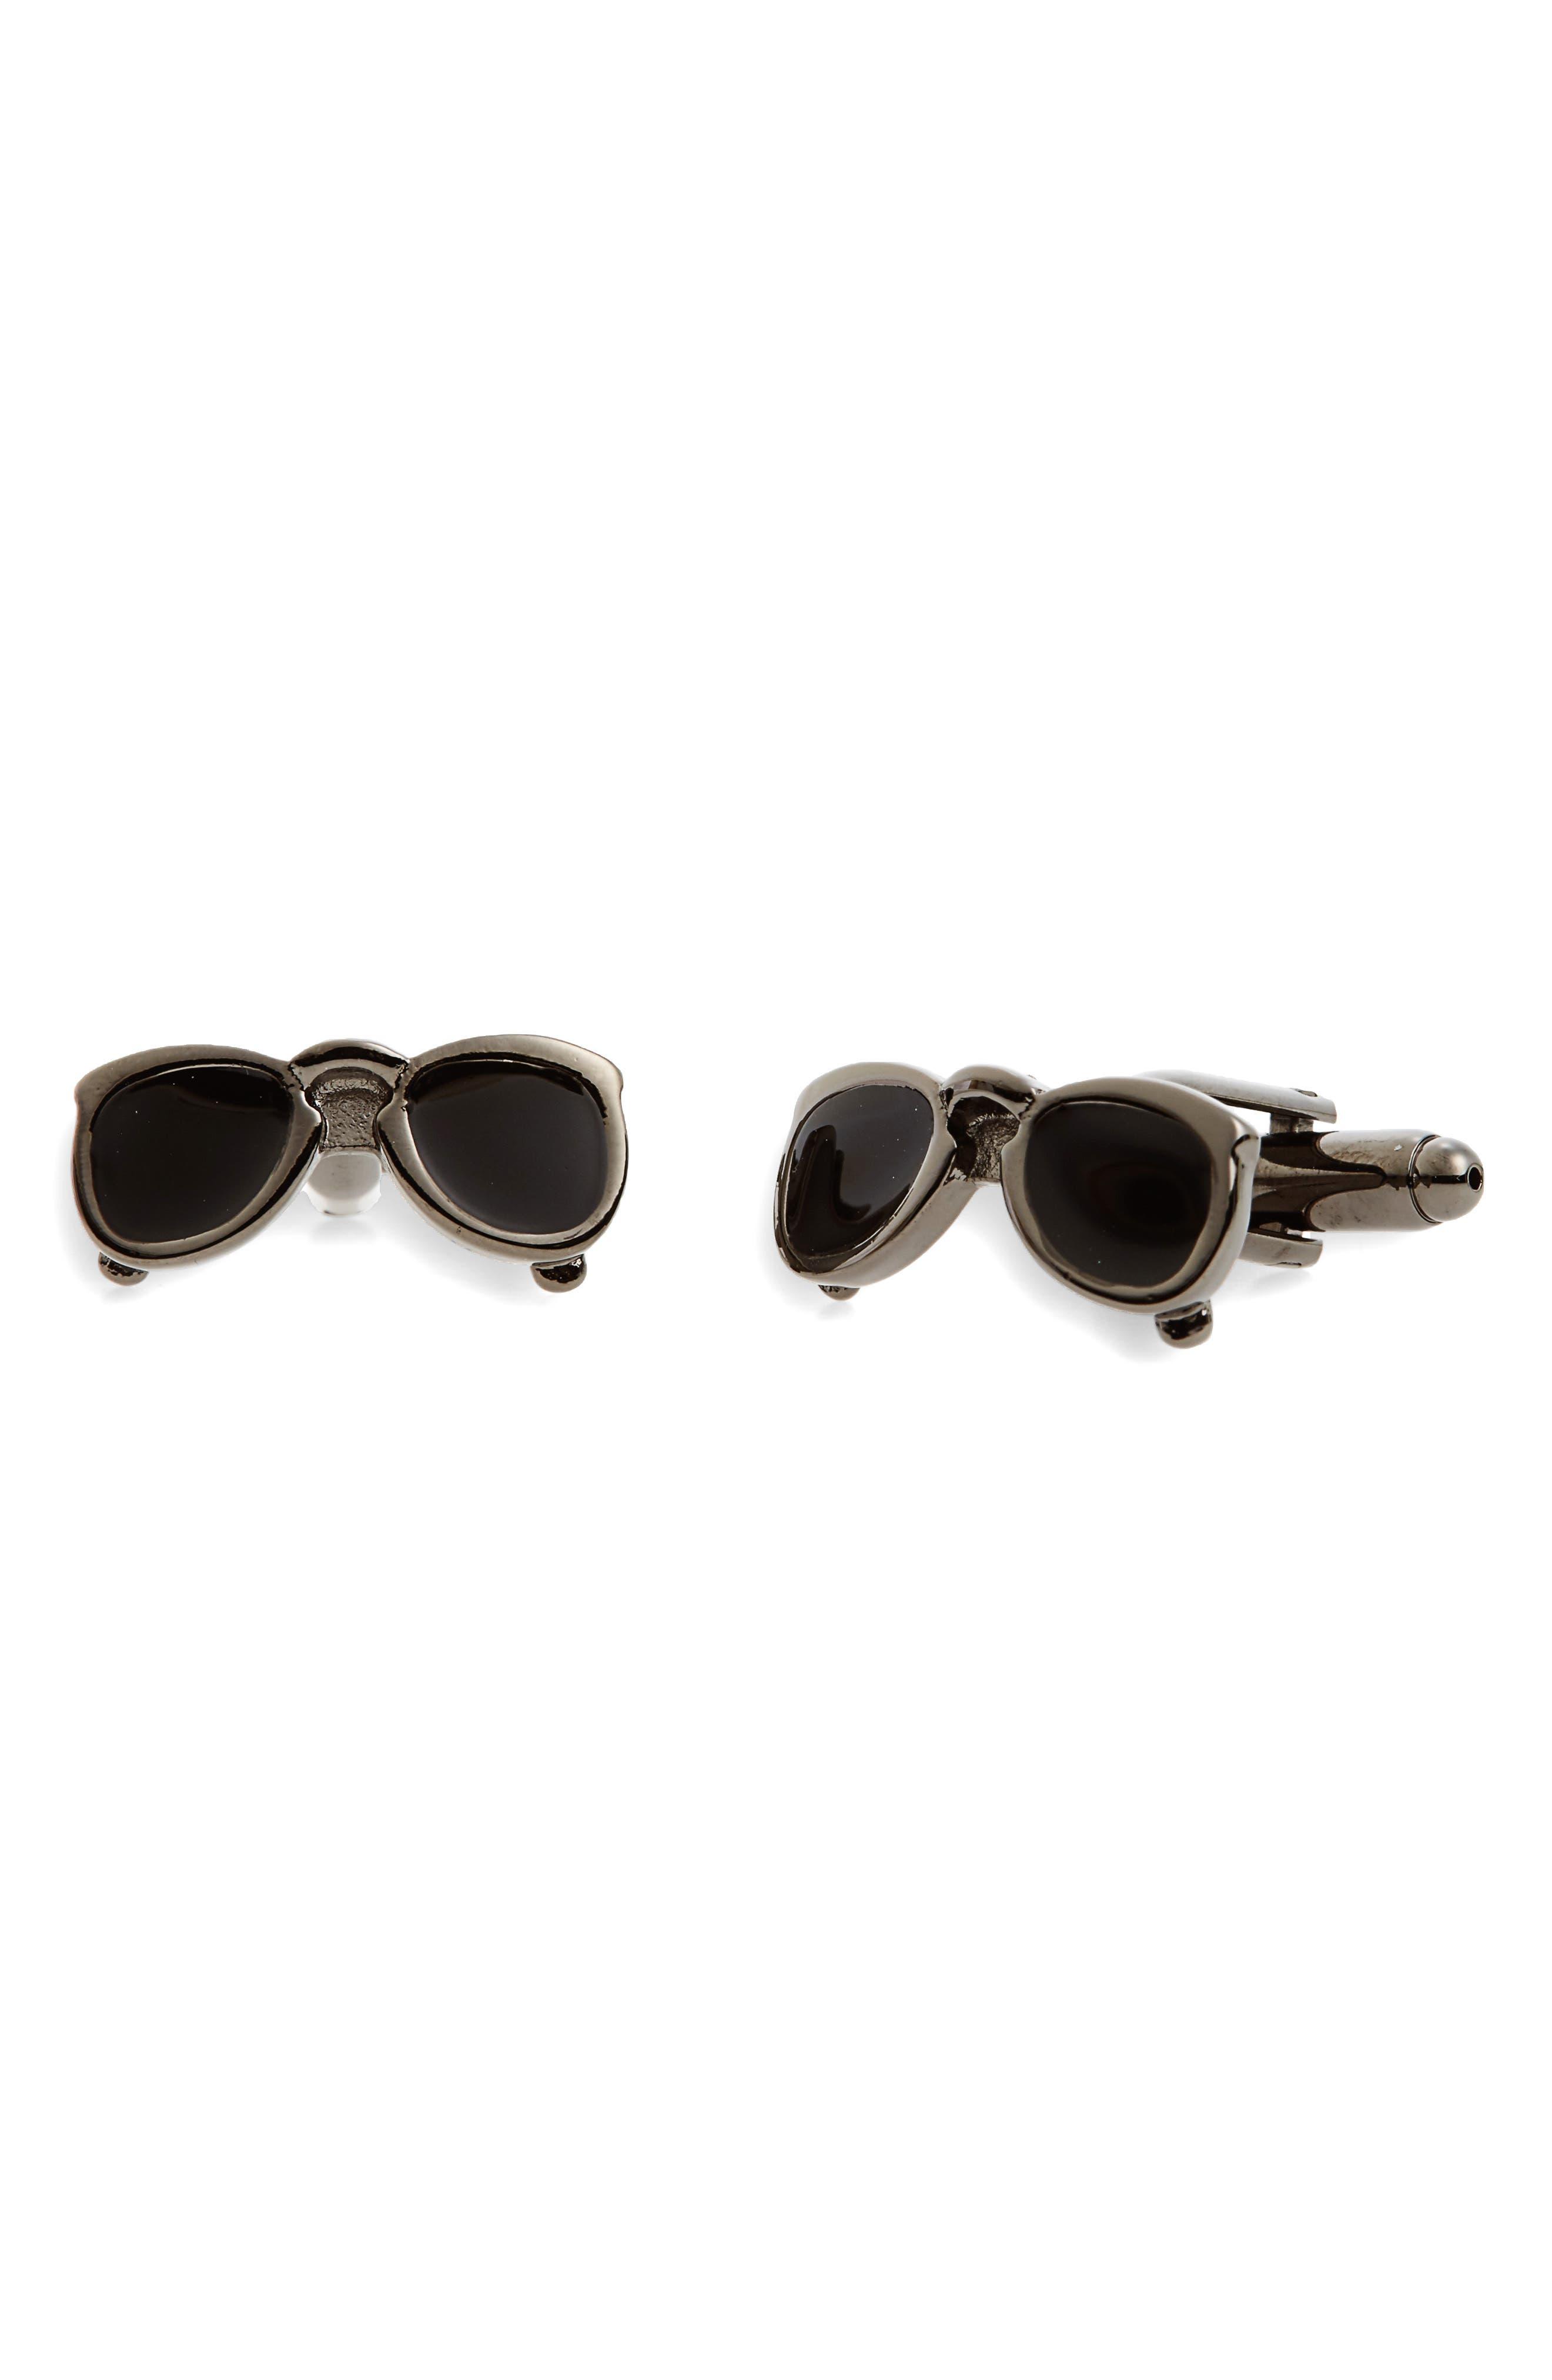 Sunglasses Cuff Links,                             Main thumbnail 1, color,                             001